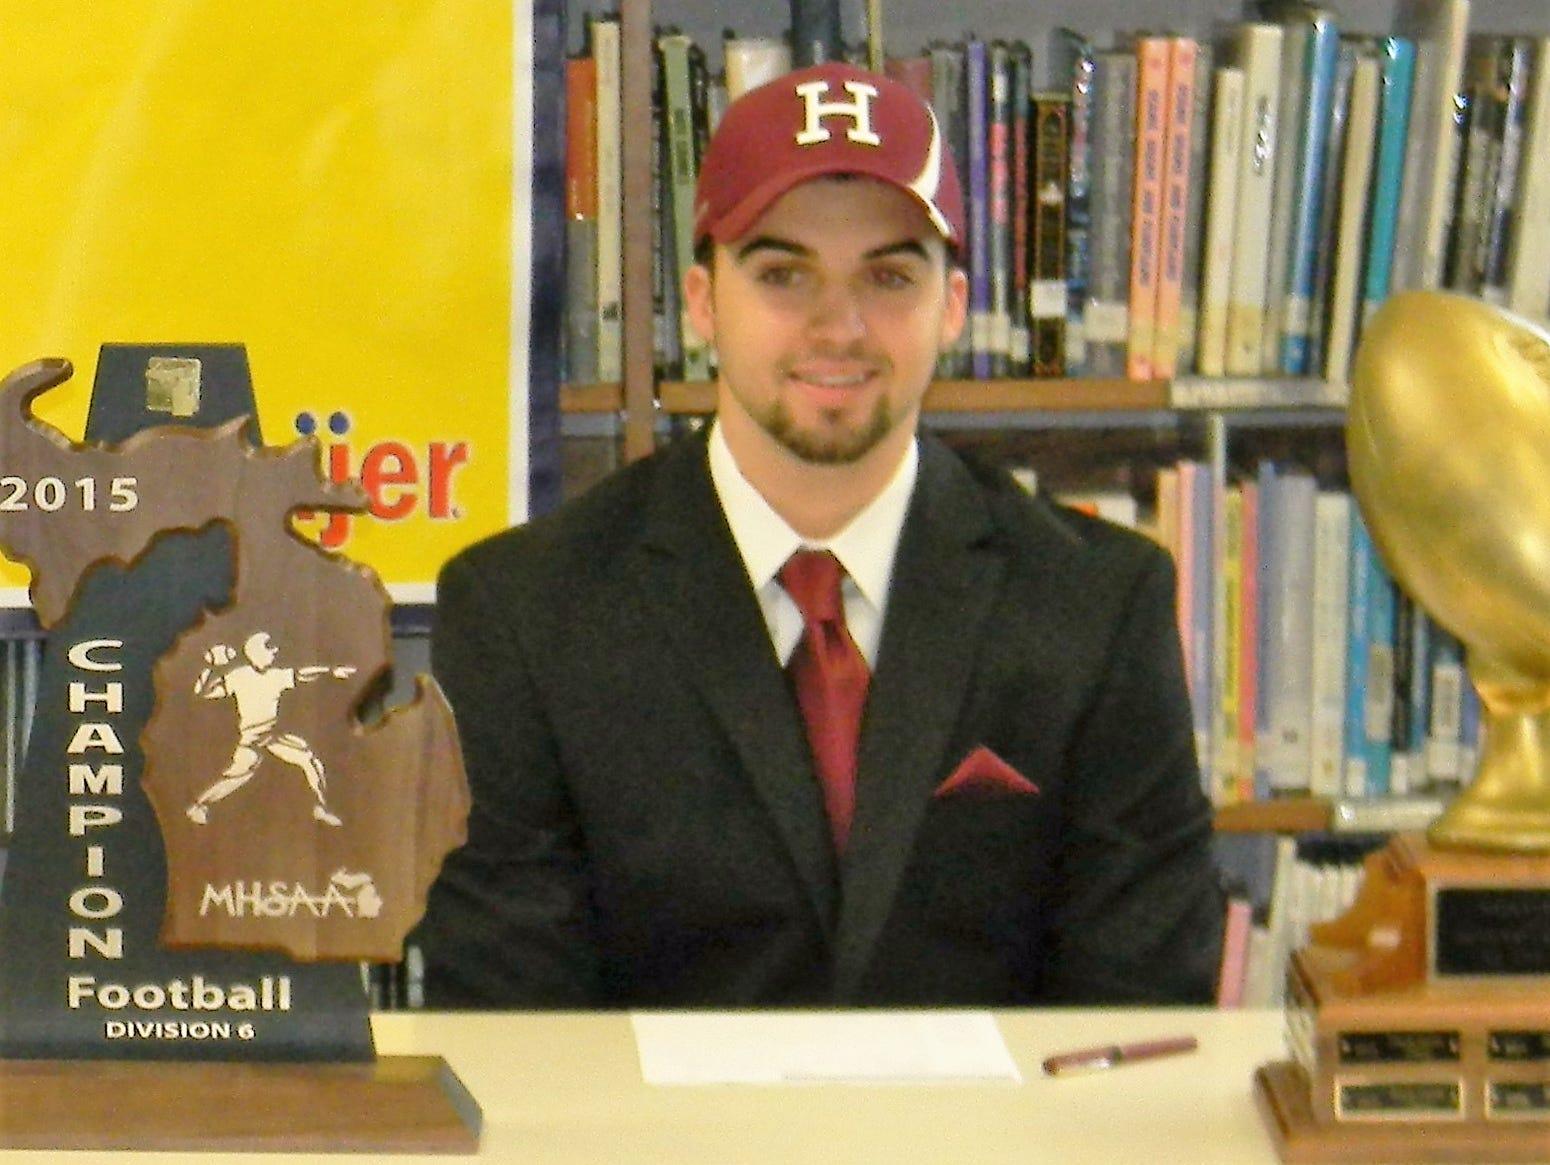 Ithaca quarterback Jake Smith signed with Harvard on Wednesday morning.